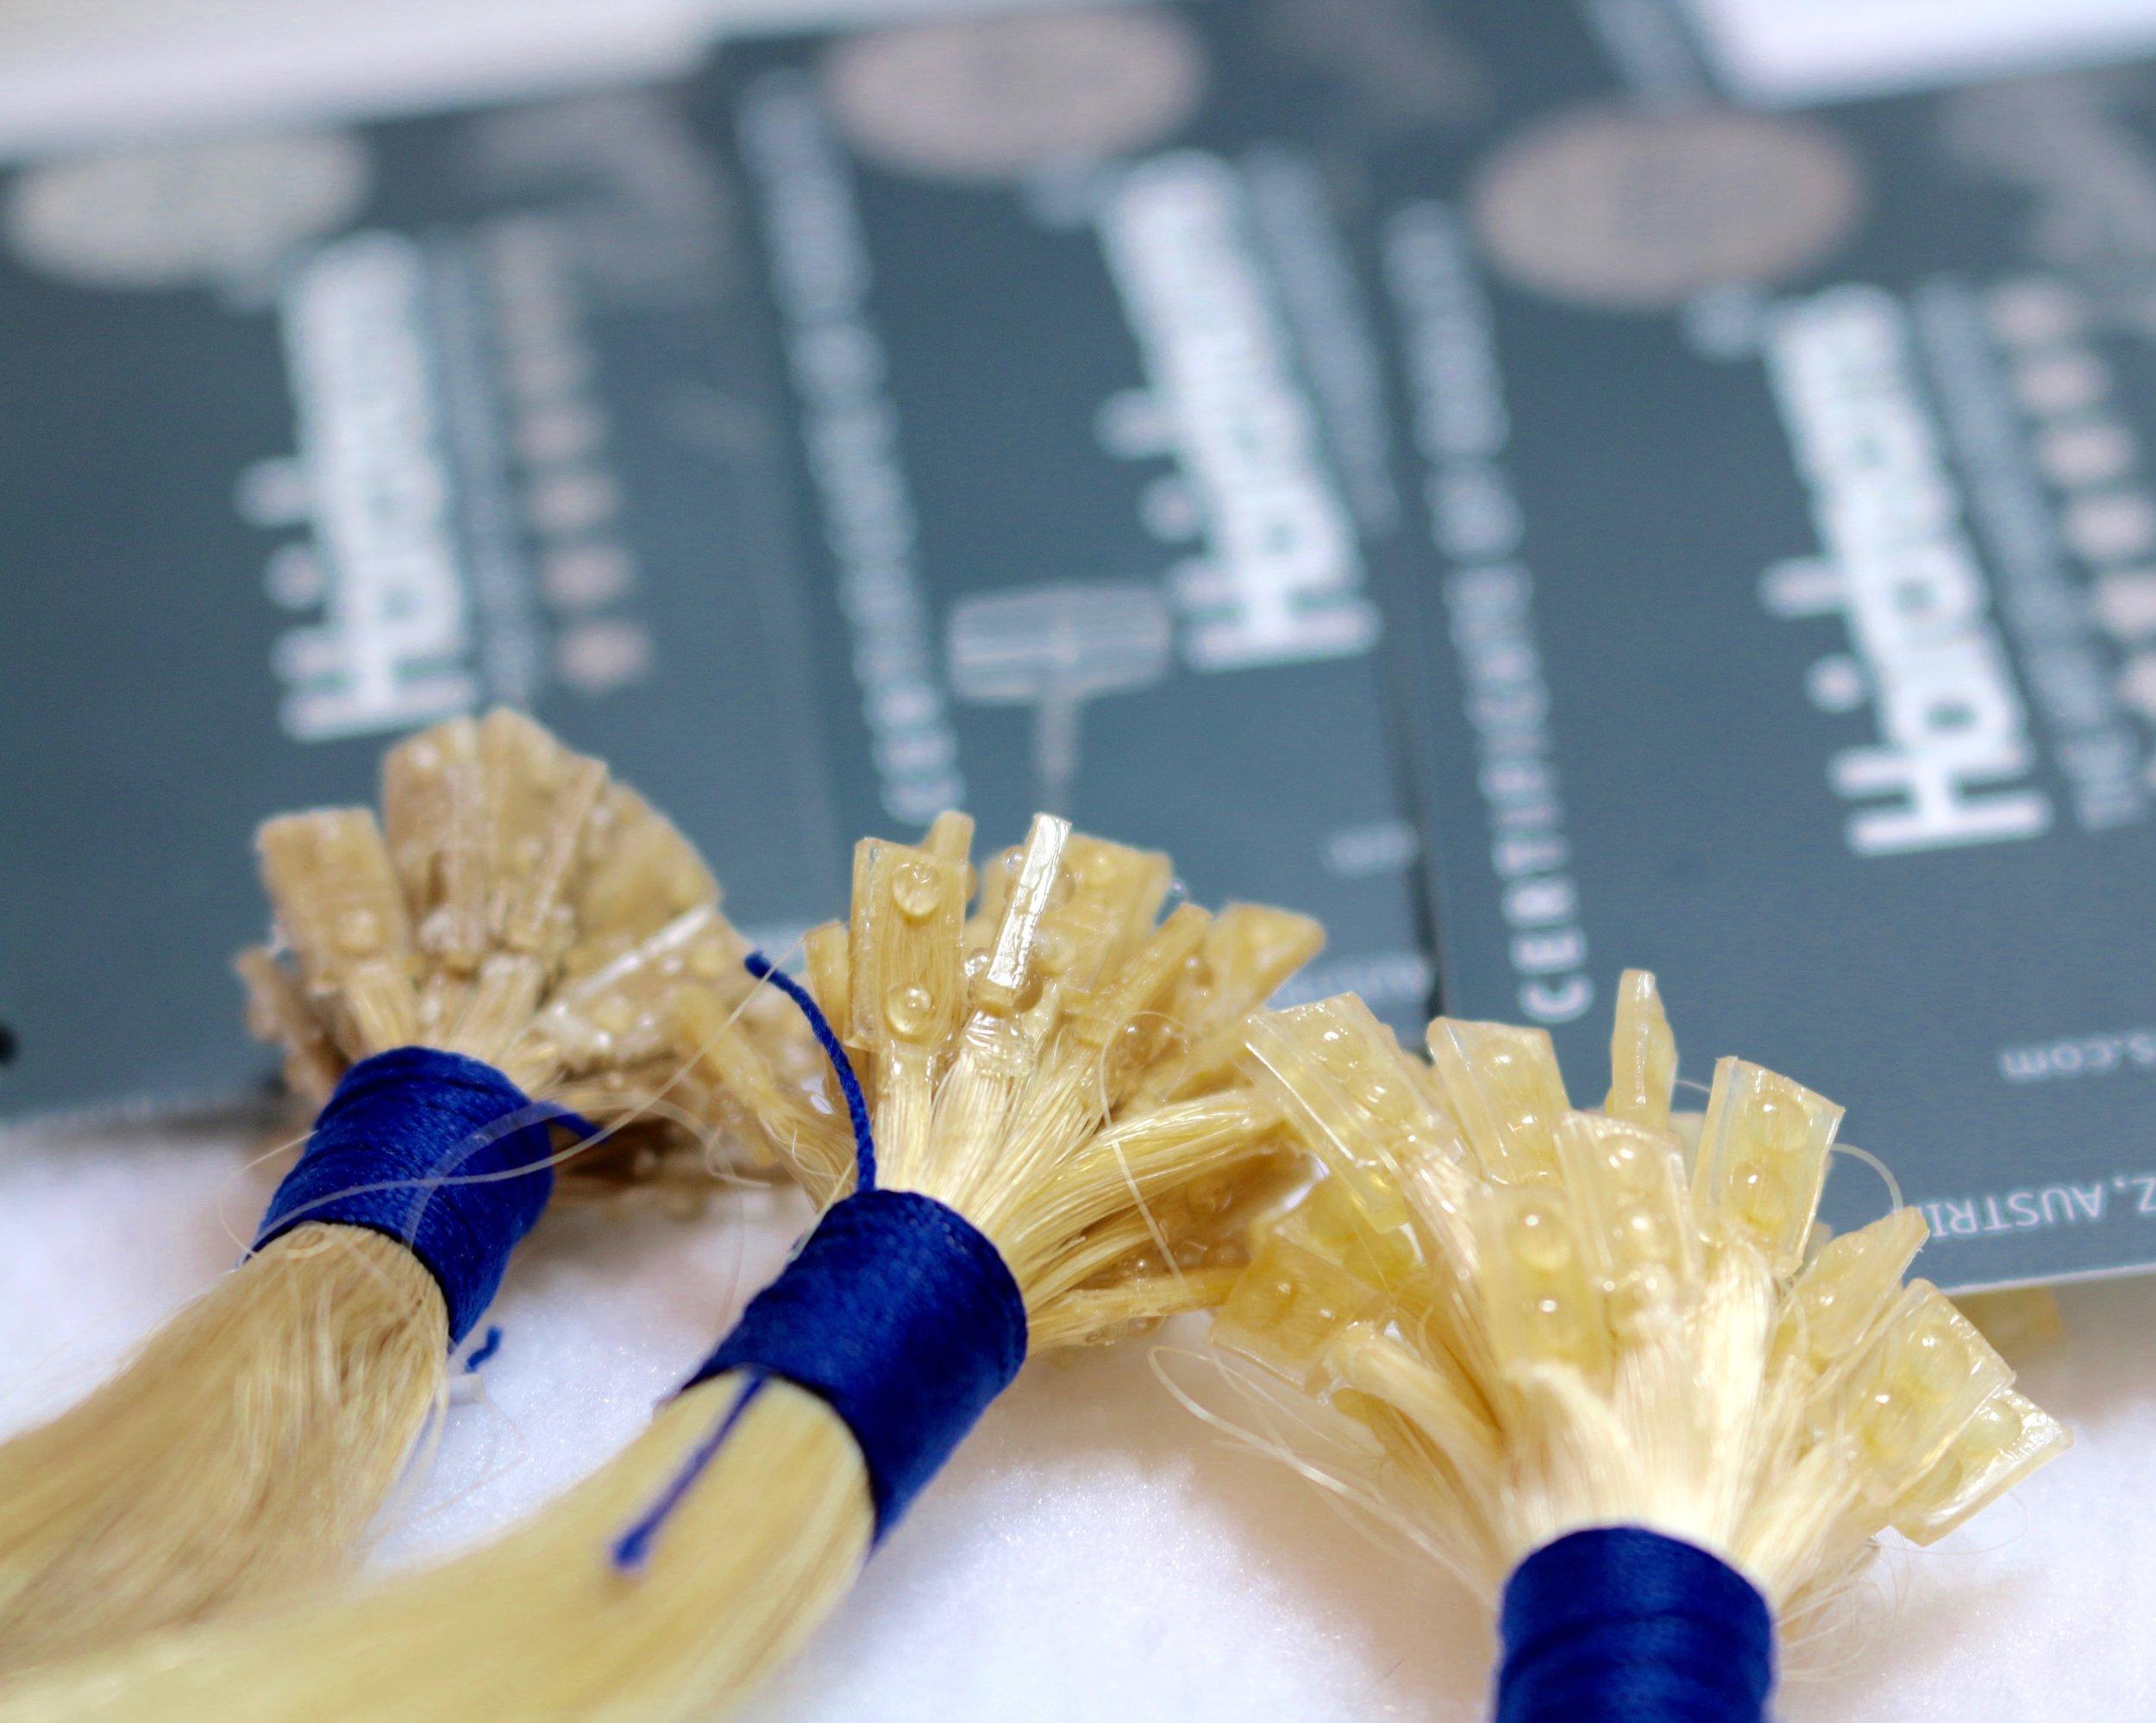 Hairdreams strands 1.jpg